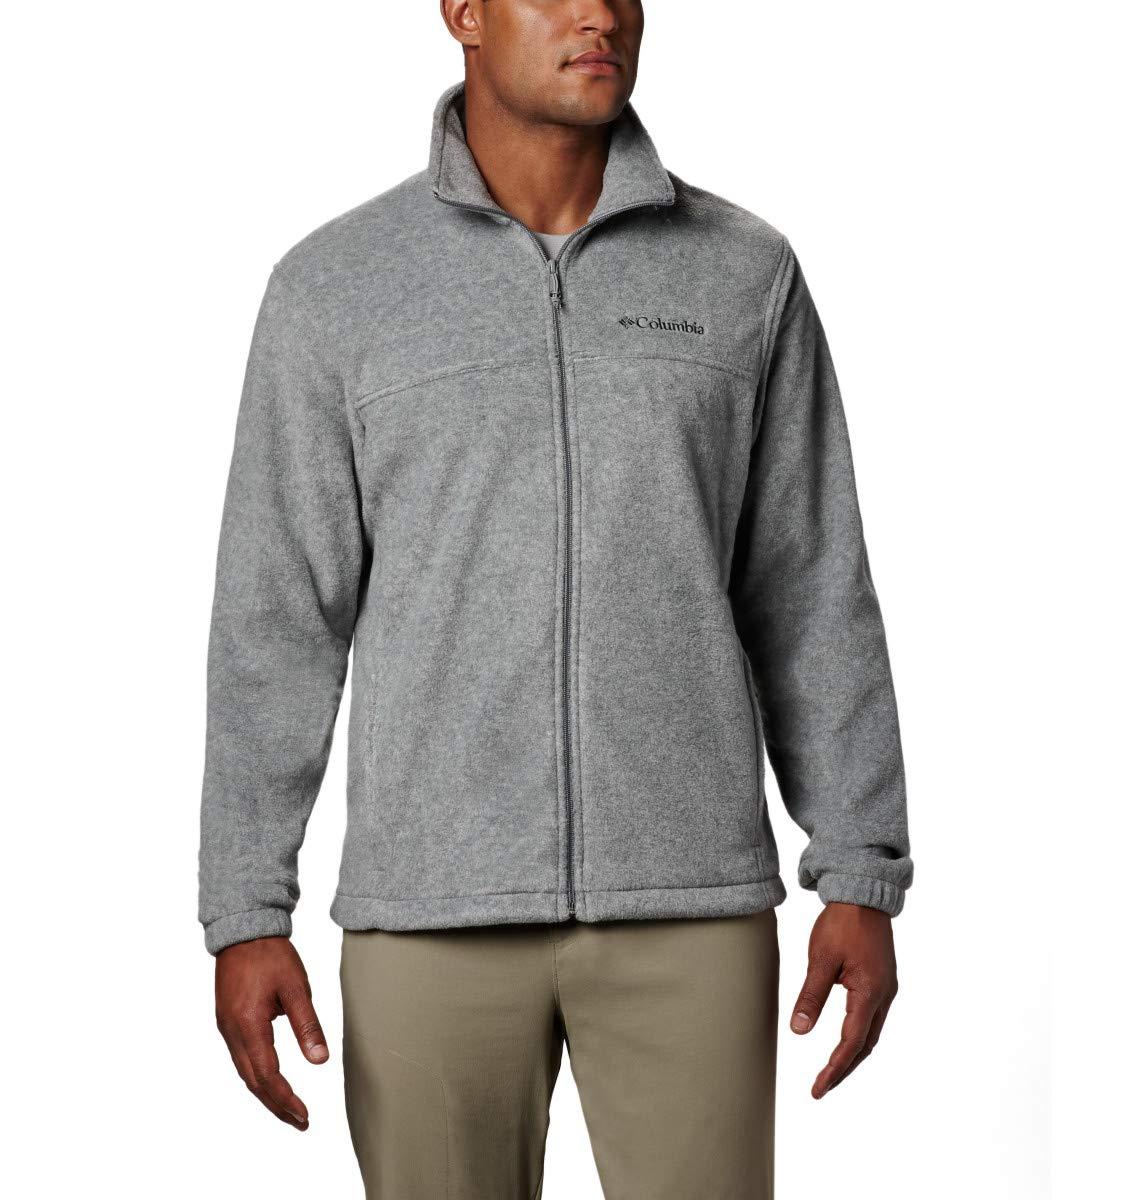 Columbia Men's Steens Mountain Full Zip 2.0, Soft Fleece with Classic Fit, Light Grey Heather, Medium by Columbia